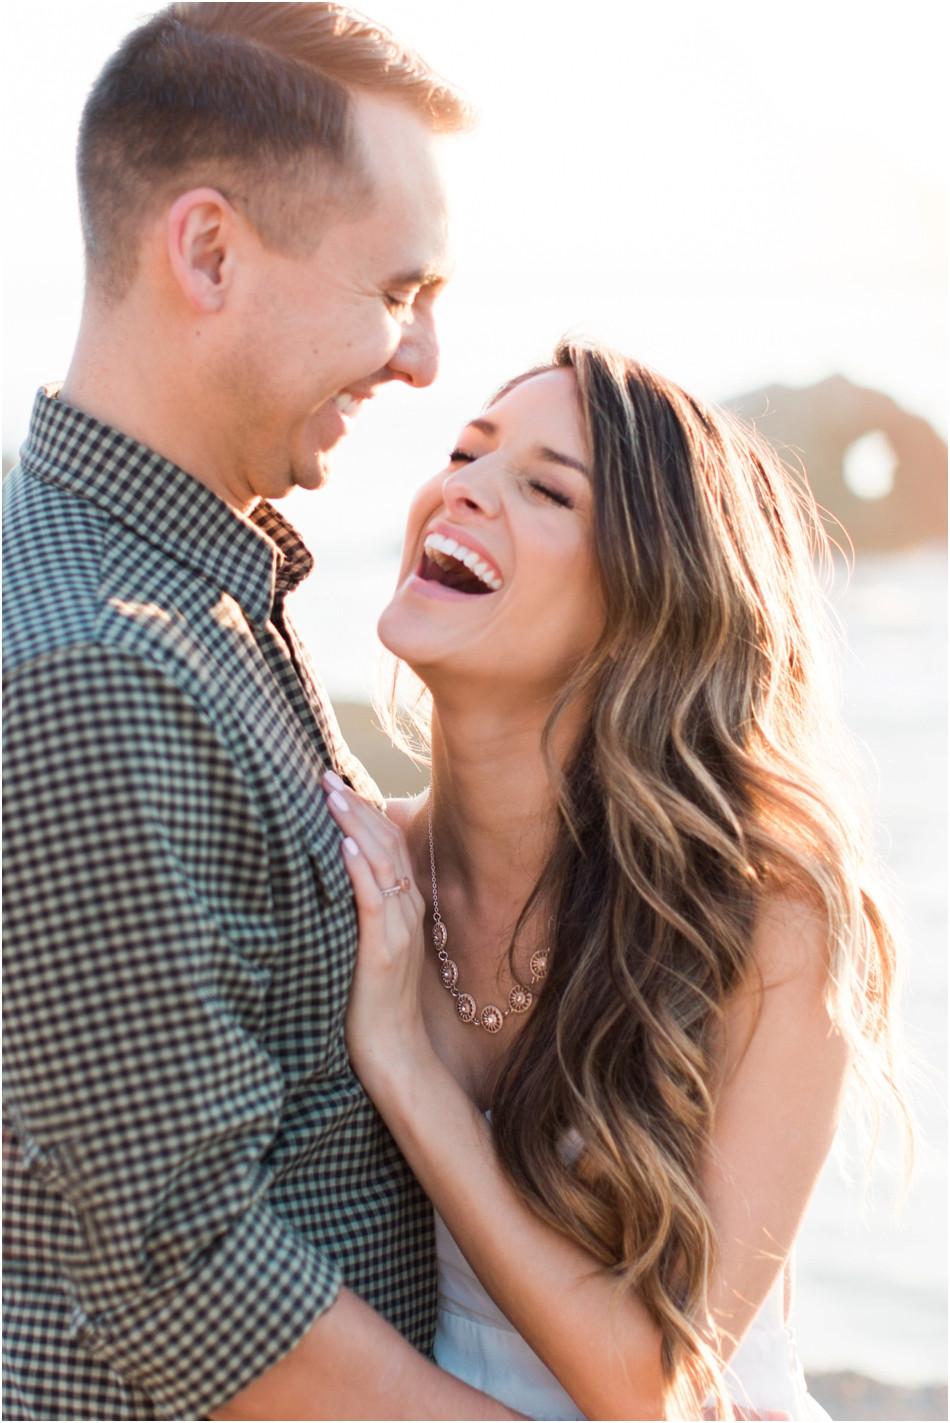 Romantic-engagement-poses